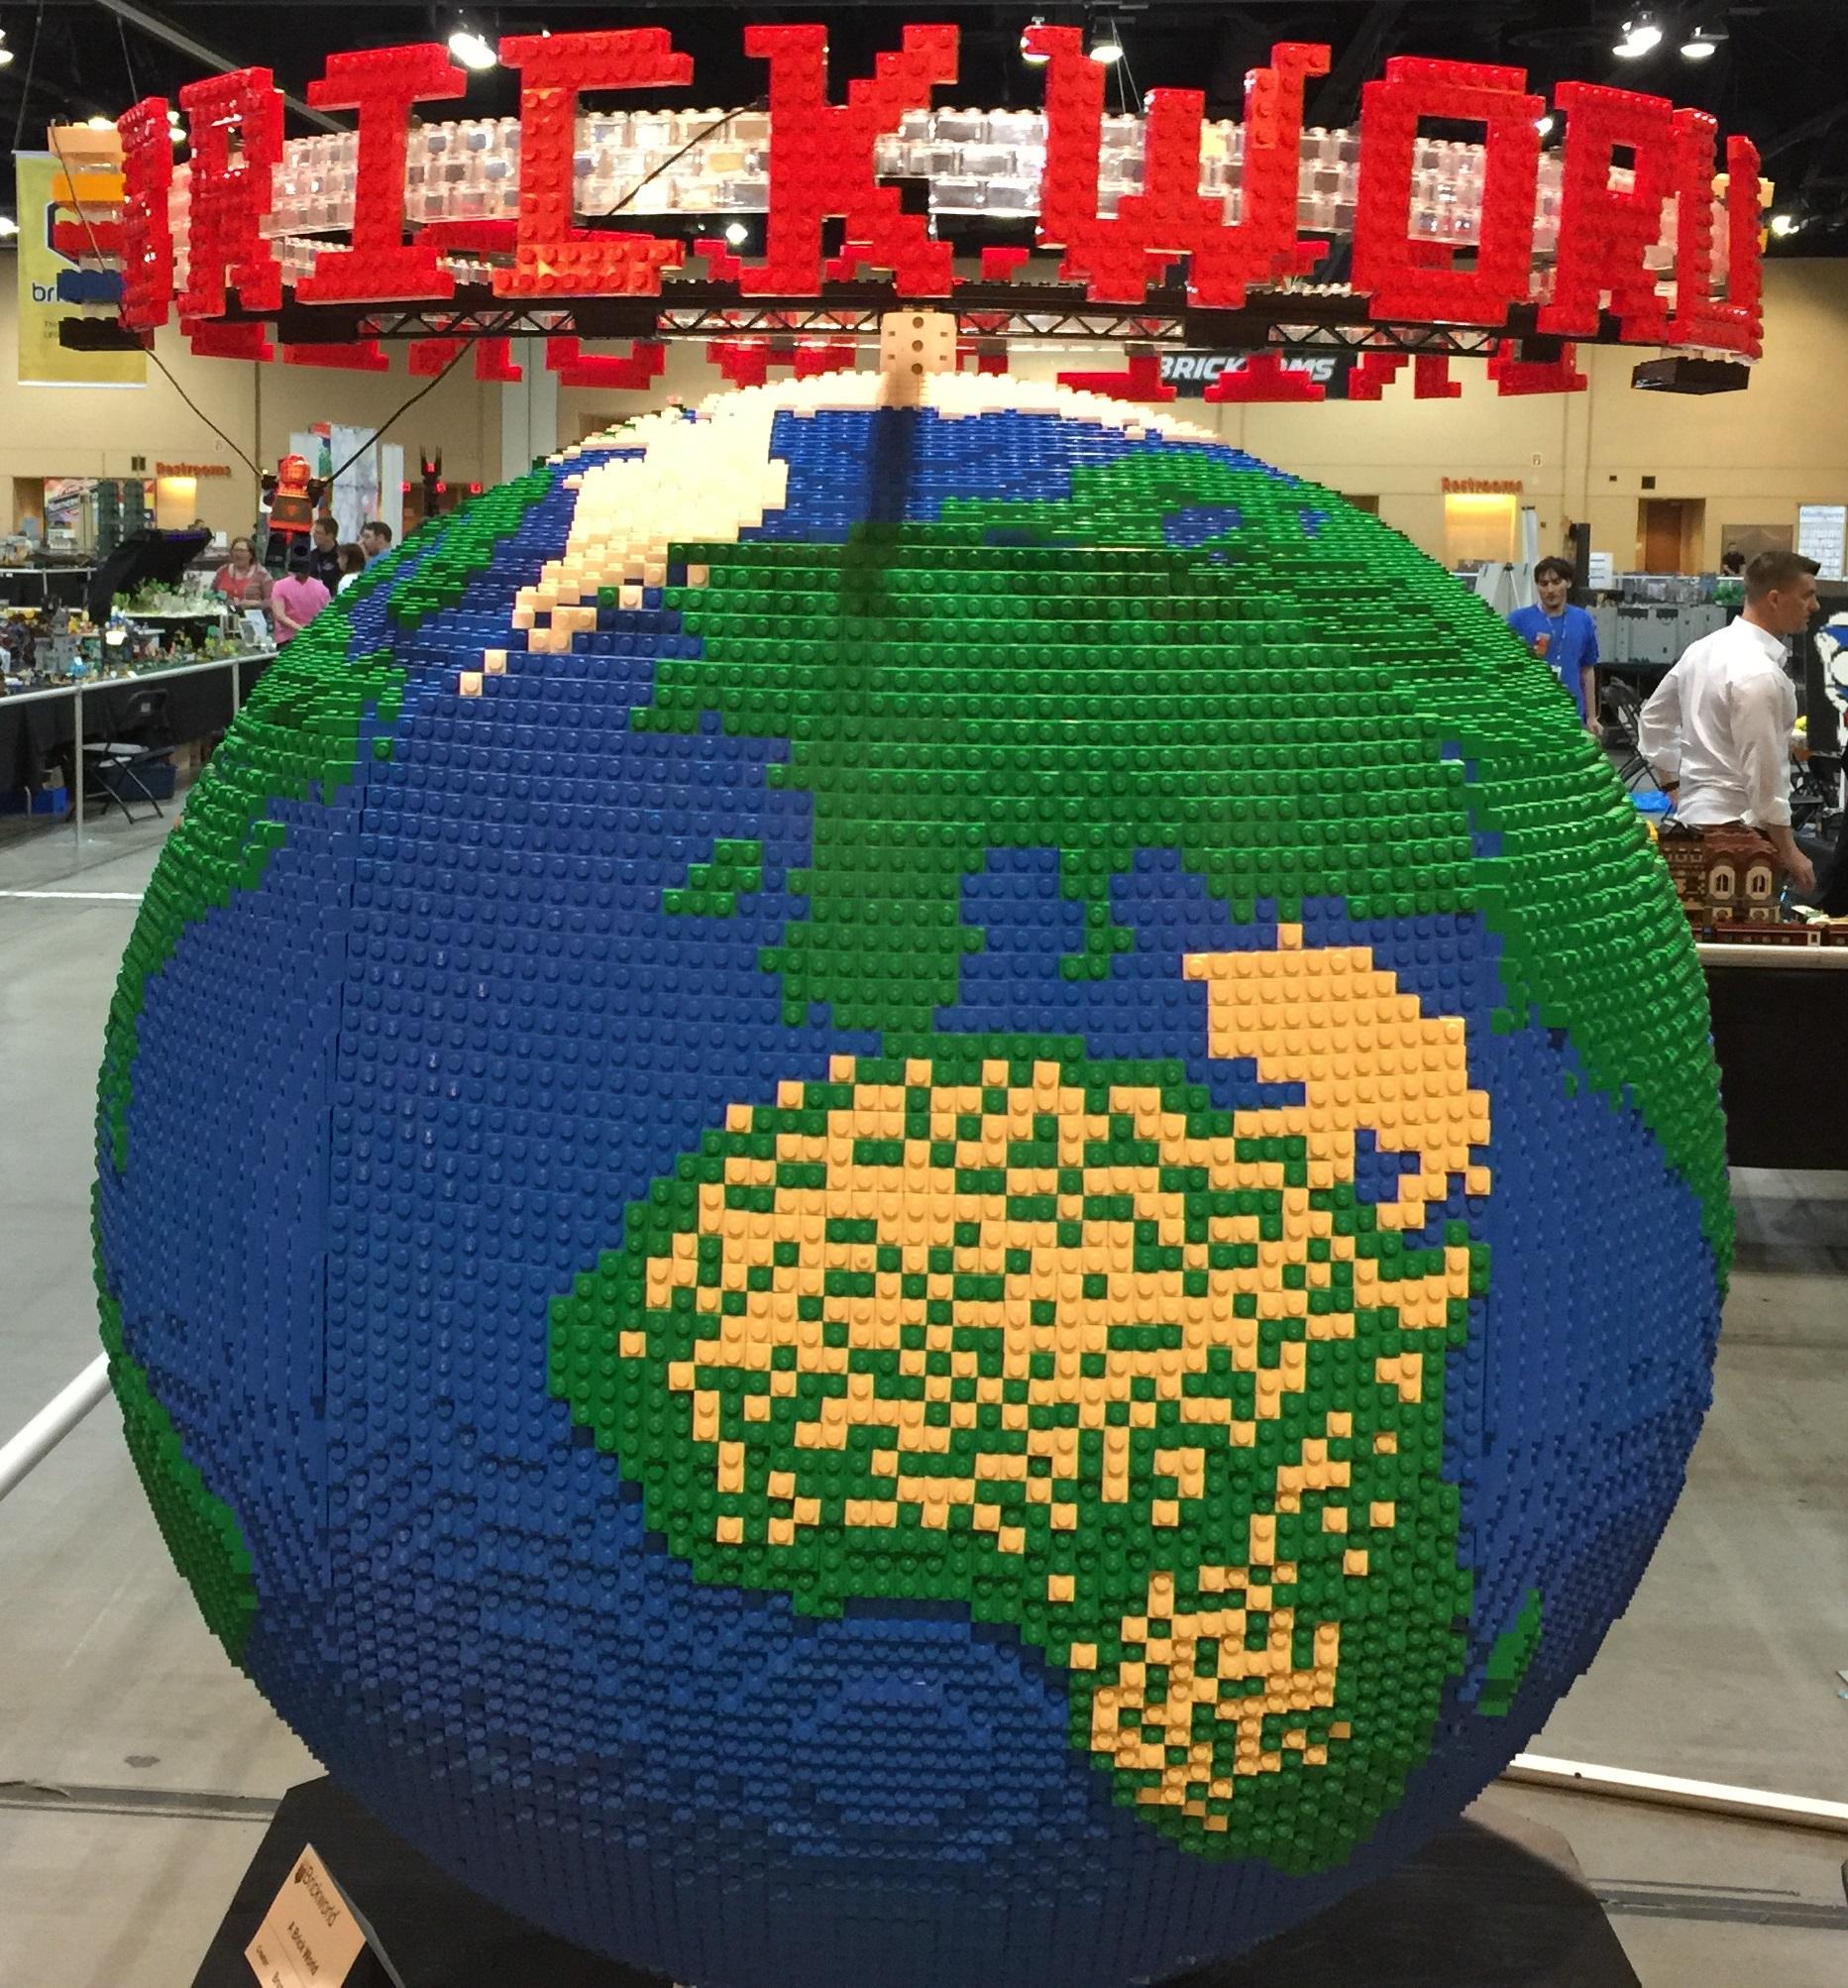 Brickworld01